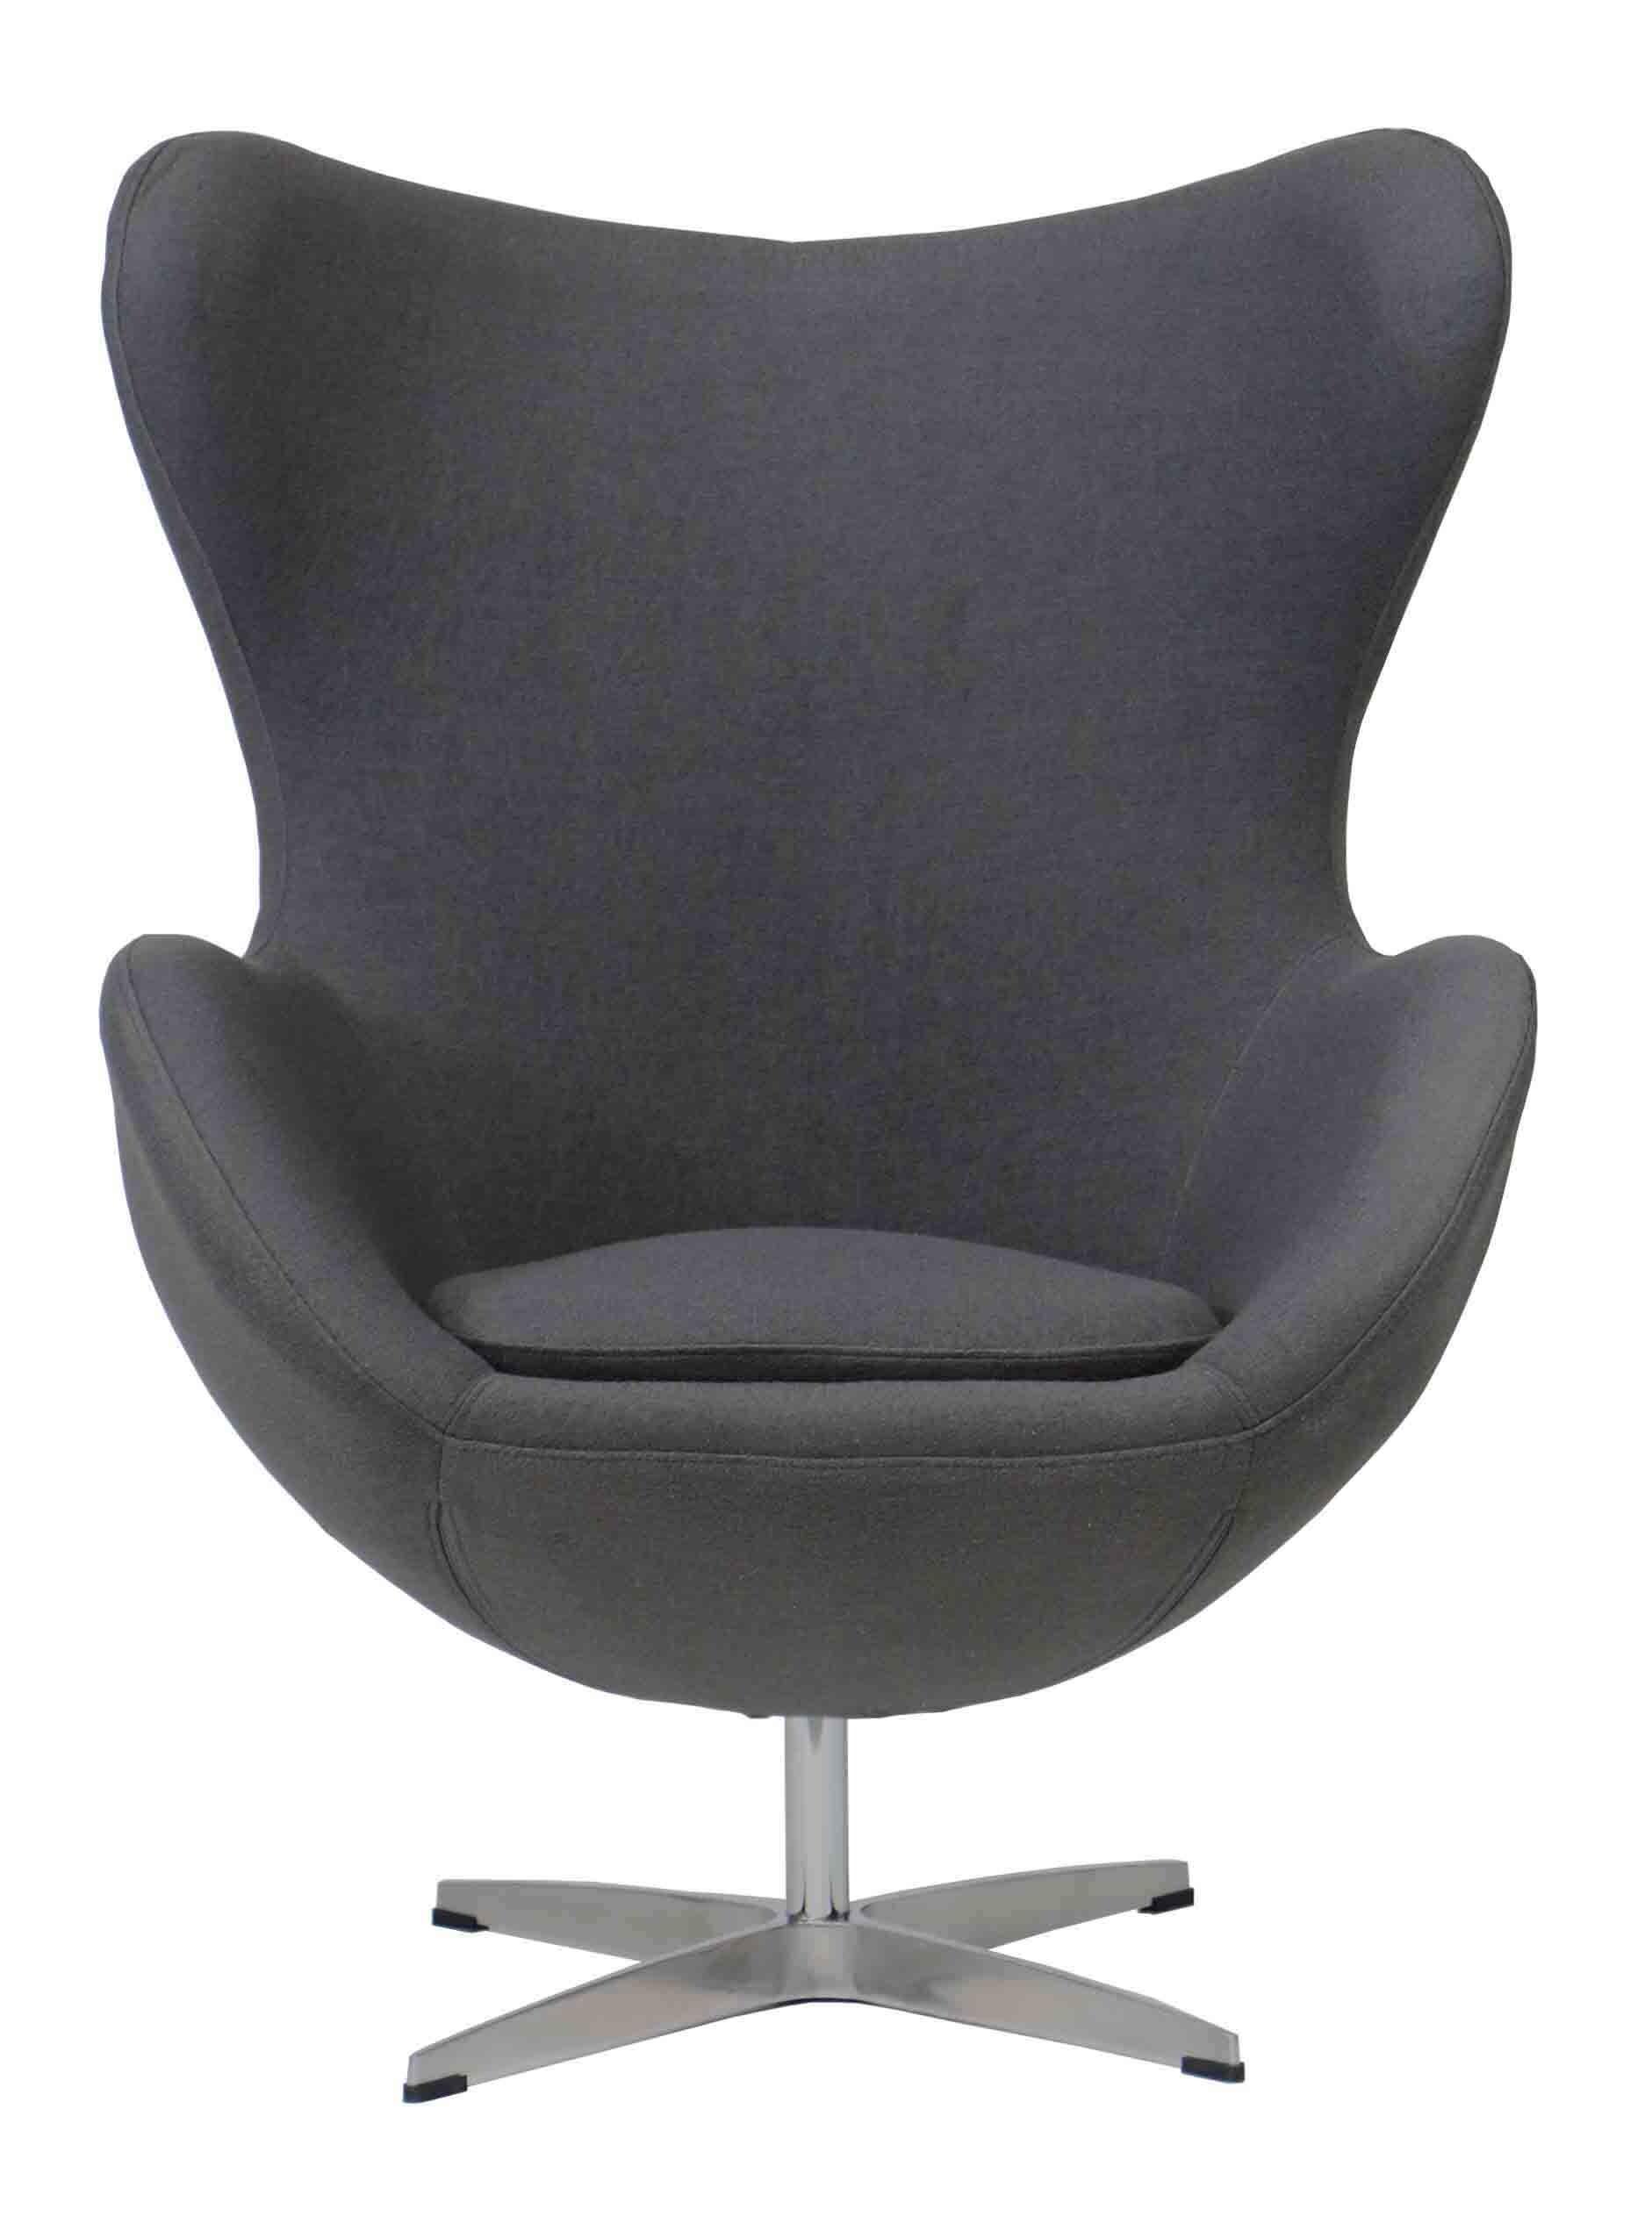 egg designs furniture. Designer Replica Egg Chair In Charcoal Egg Designs Furniture L